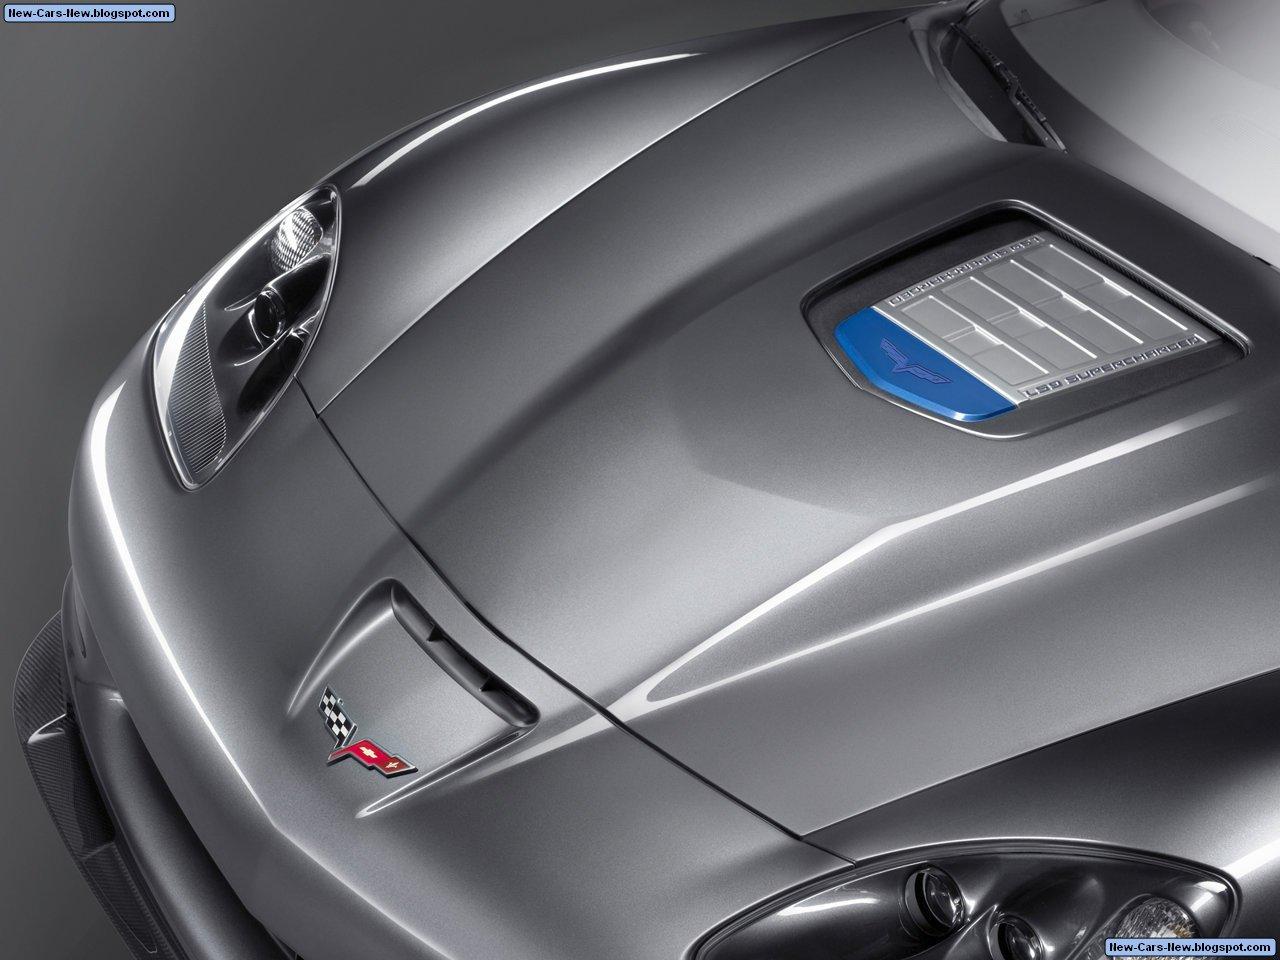 http://3.bp.blogspot.com/_U4w592tUDHM/TDybRFZwKCI/AAAAAAAAEP0/16WJ3jcTIOc/s1600/Chevrolet-Corvette_ZR1_2009_1280x960_wallpaper_04.jpg